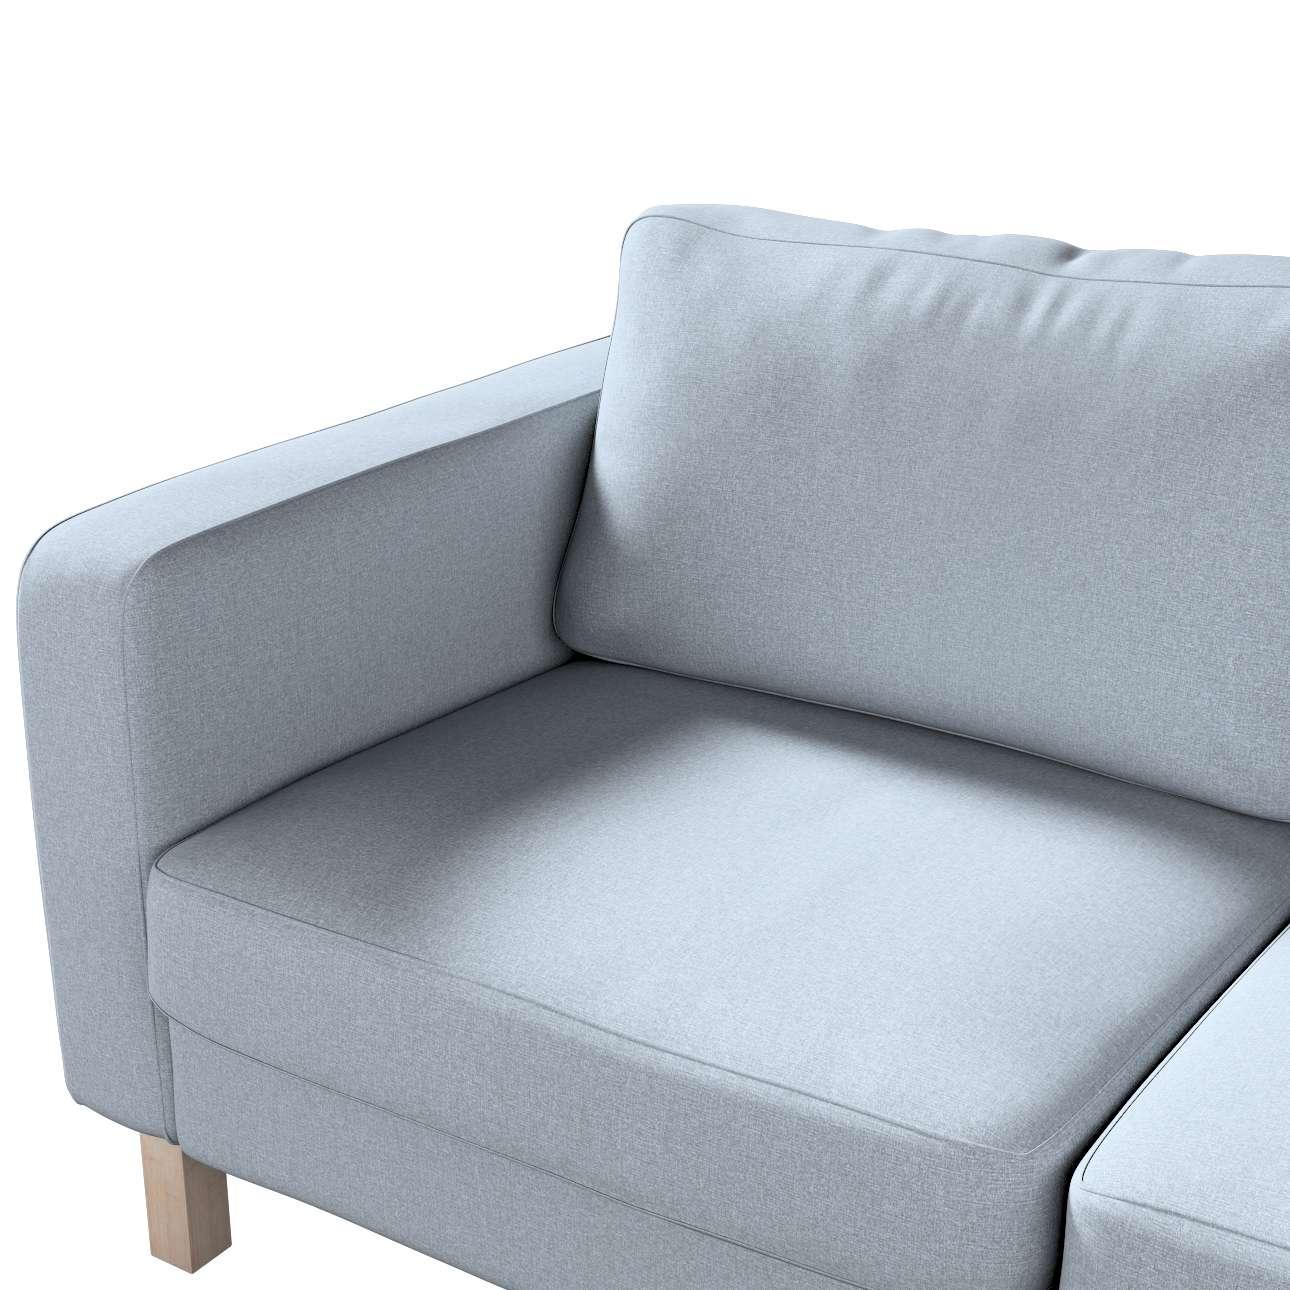 Karlstad klädsel 2-sits soffa - kort i kollektionen Amsterdam, Tyg: 704-46